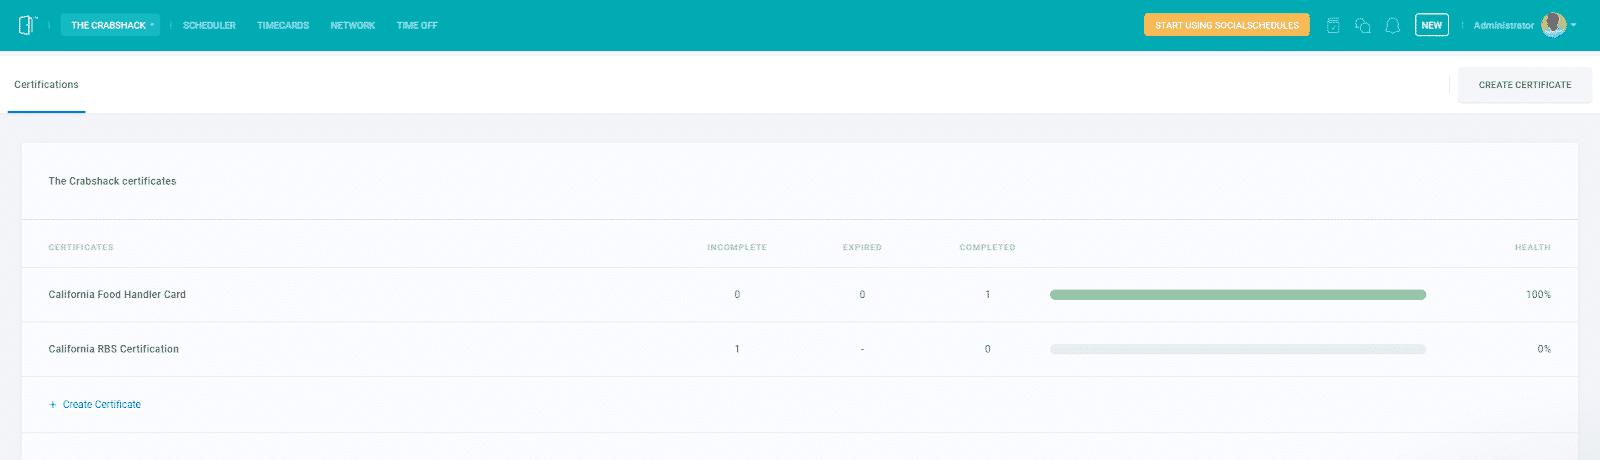 Screenshot of SocialSchedules_track employee certifications